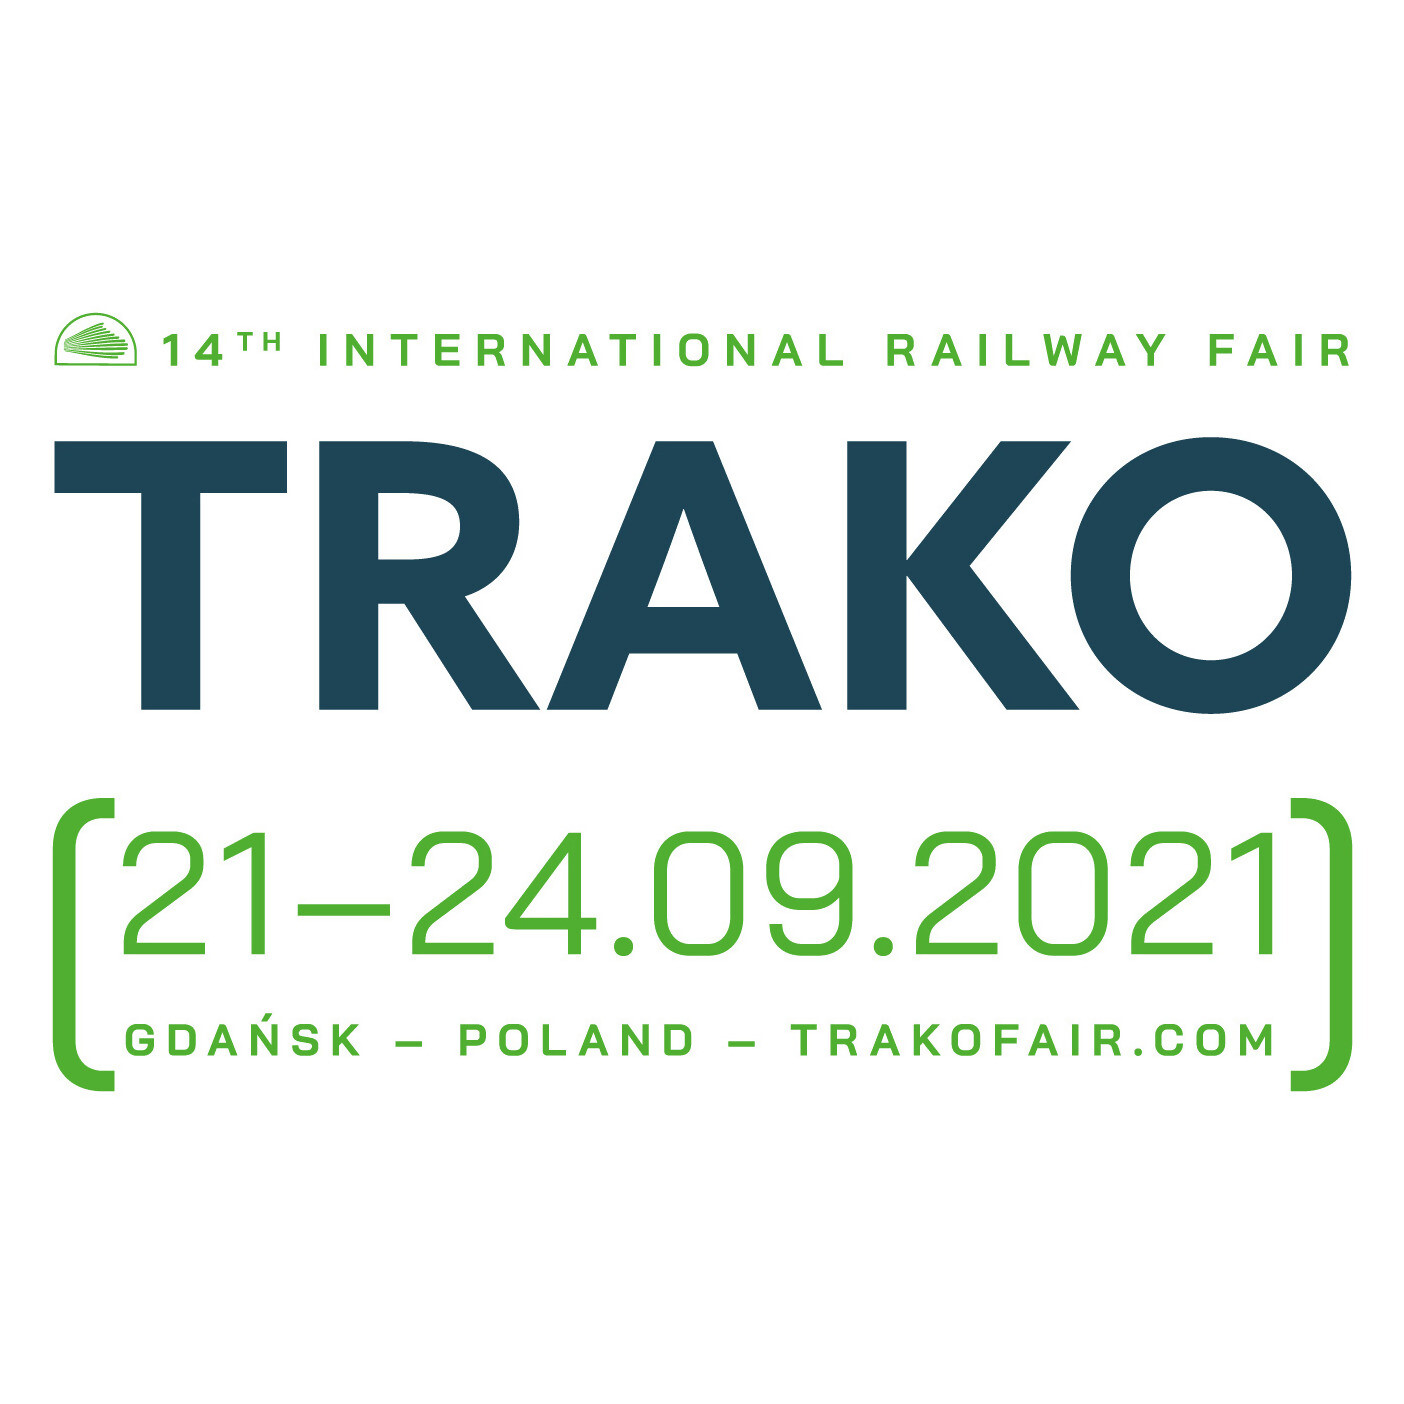 TRAKO logo 21-24.09.2021